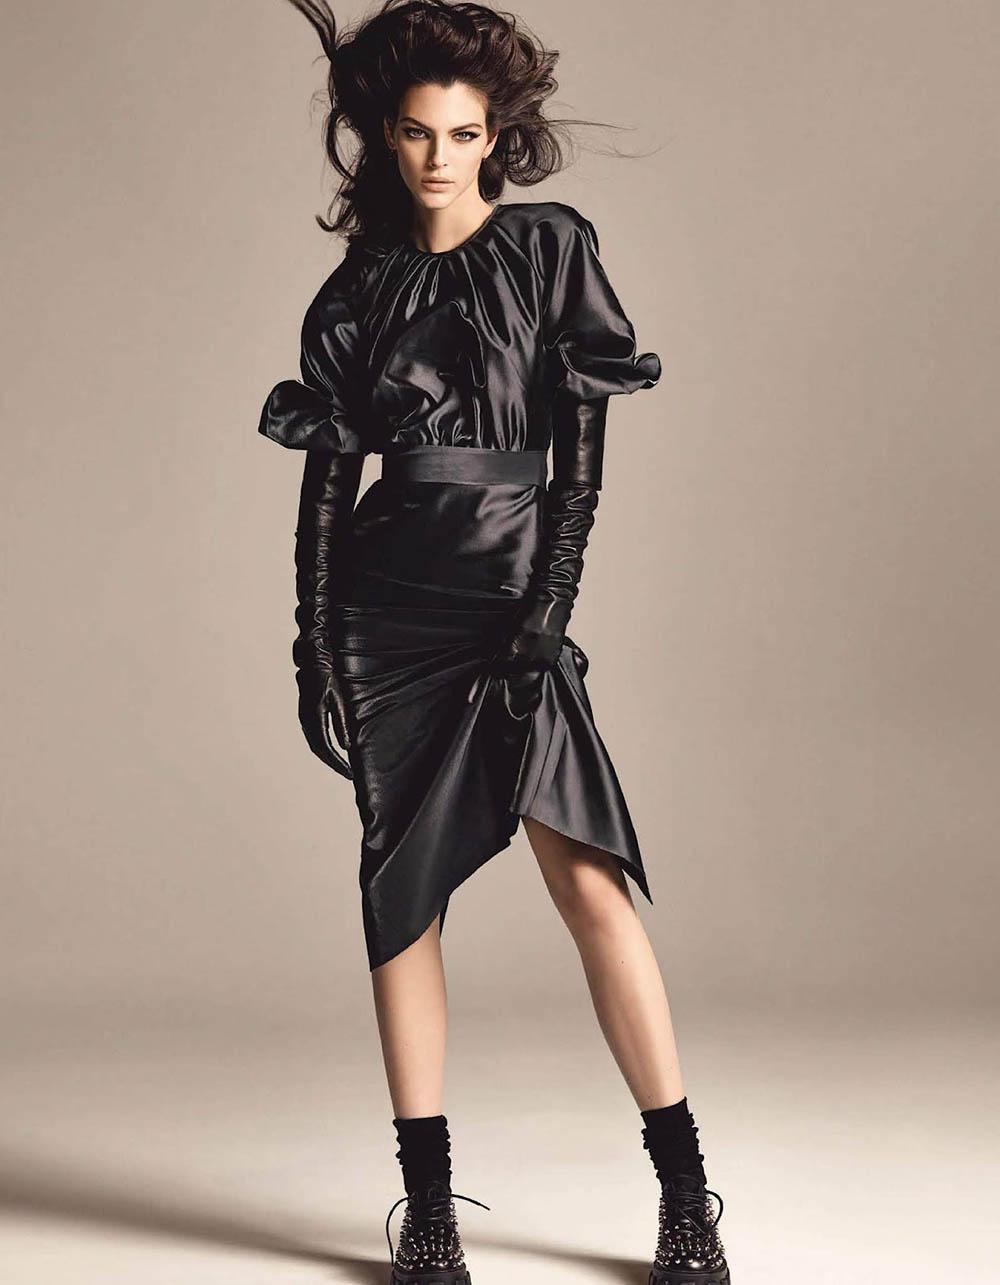 Vittoria Ceretti covers Vogue Japan August 2019 by Luigi & Iango